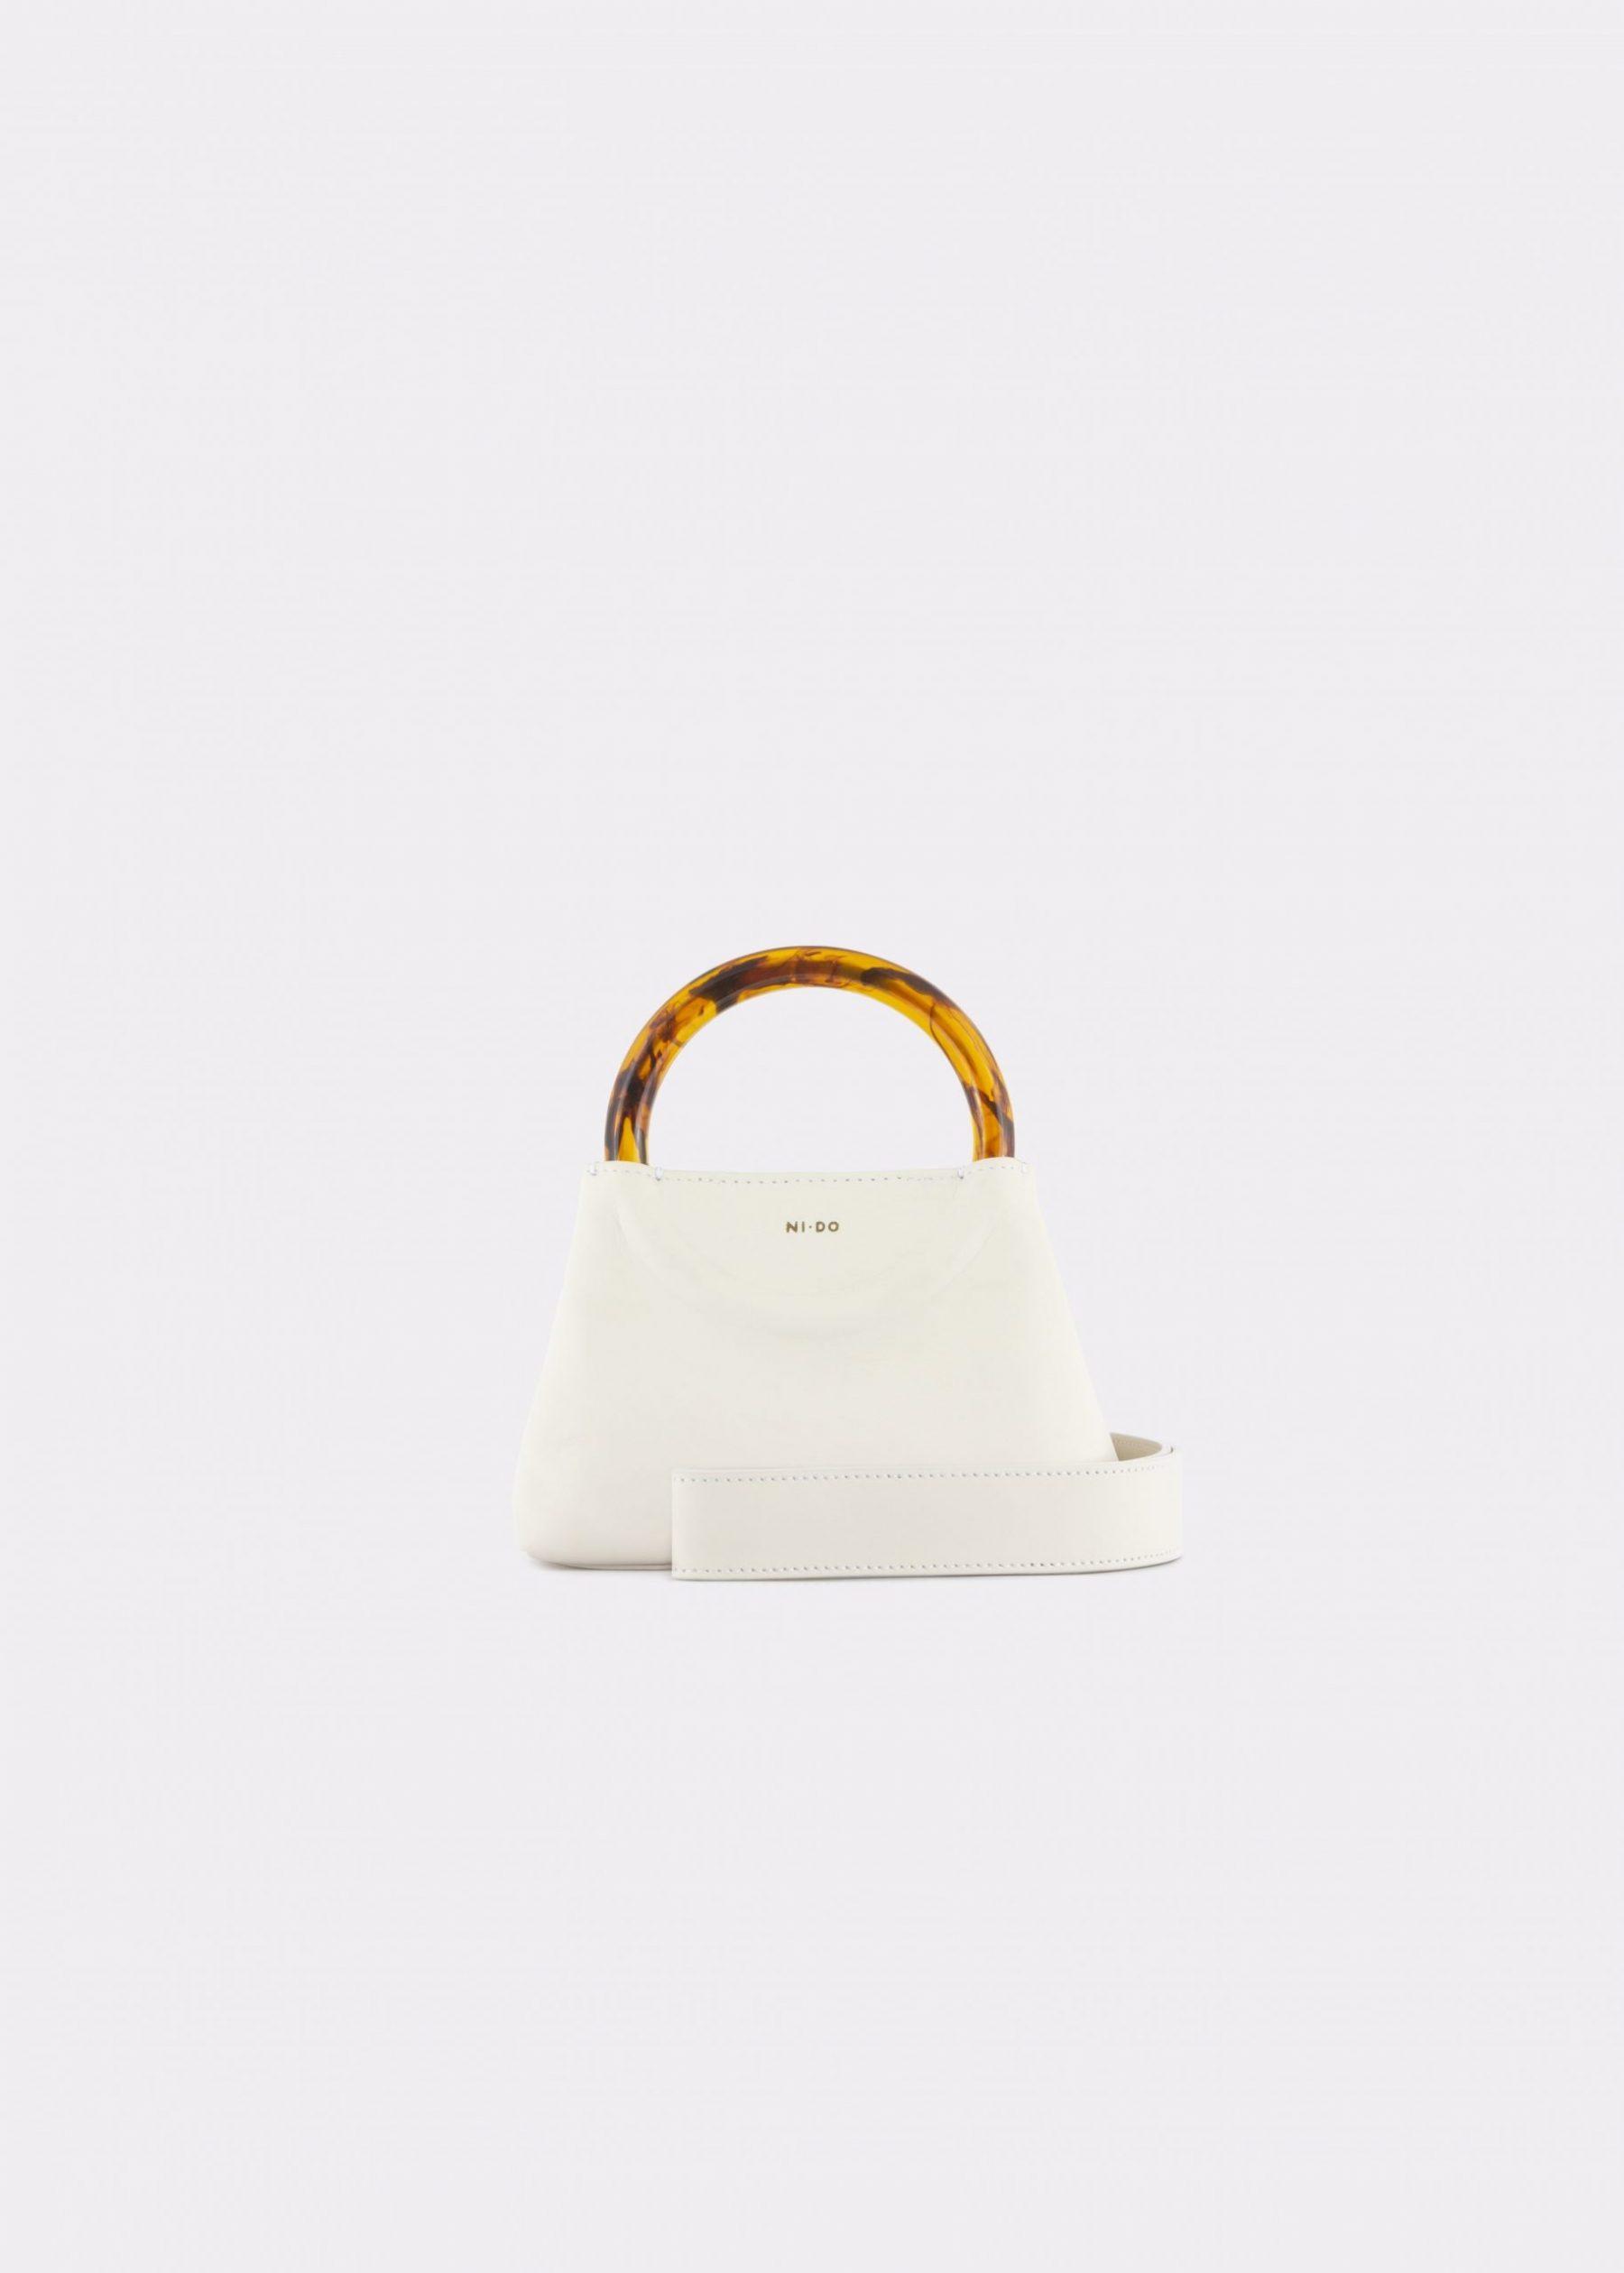 NIDO Bolla Micro bag soy milk leather Amber_shoulder strap view